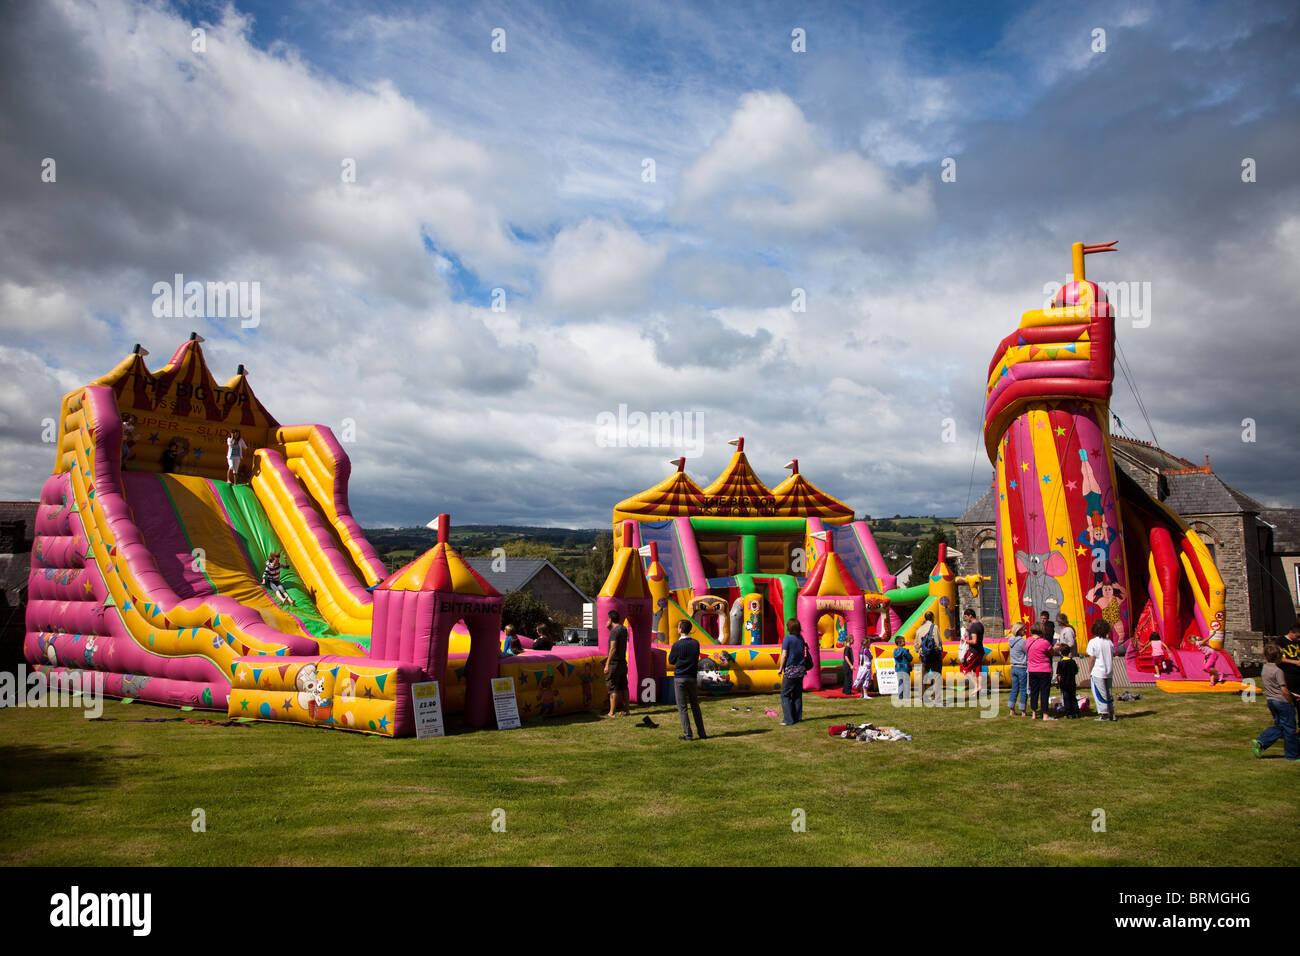 Bouncy Castle und Kirmes Attraktionen Talgarth Wales UK Stockbild